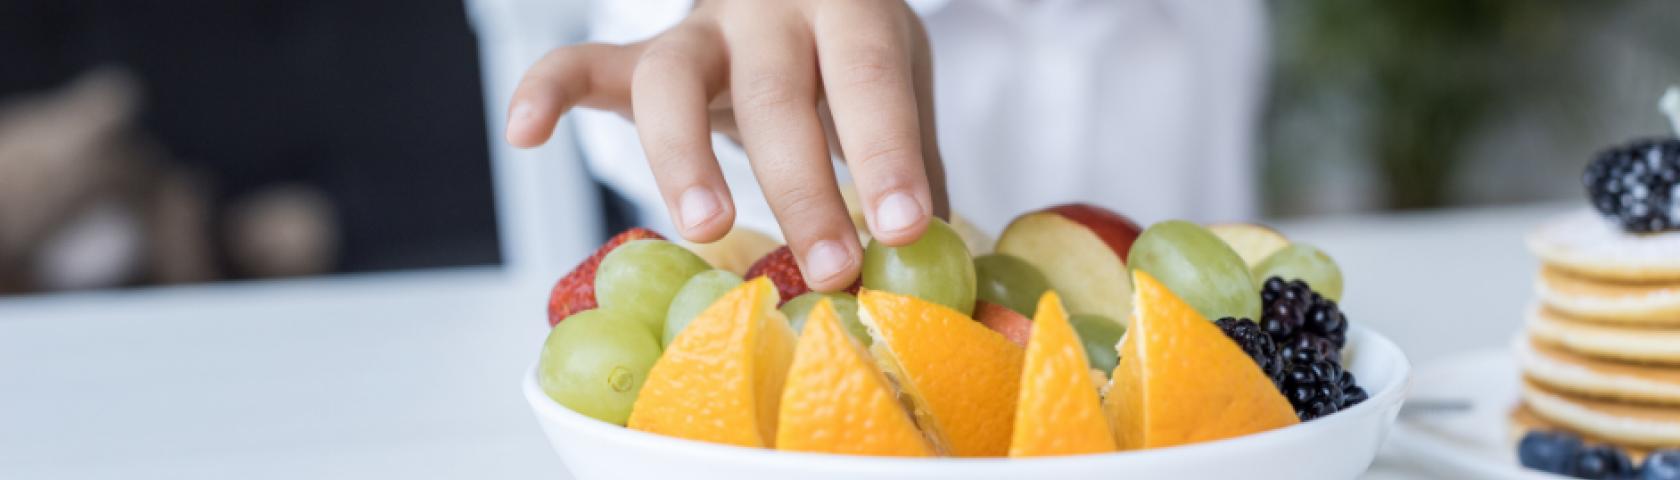 Kinderdietist kind fruit eten